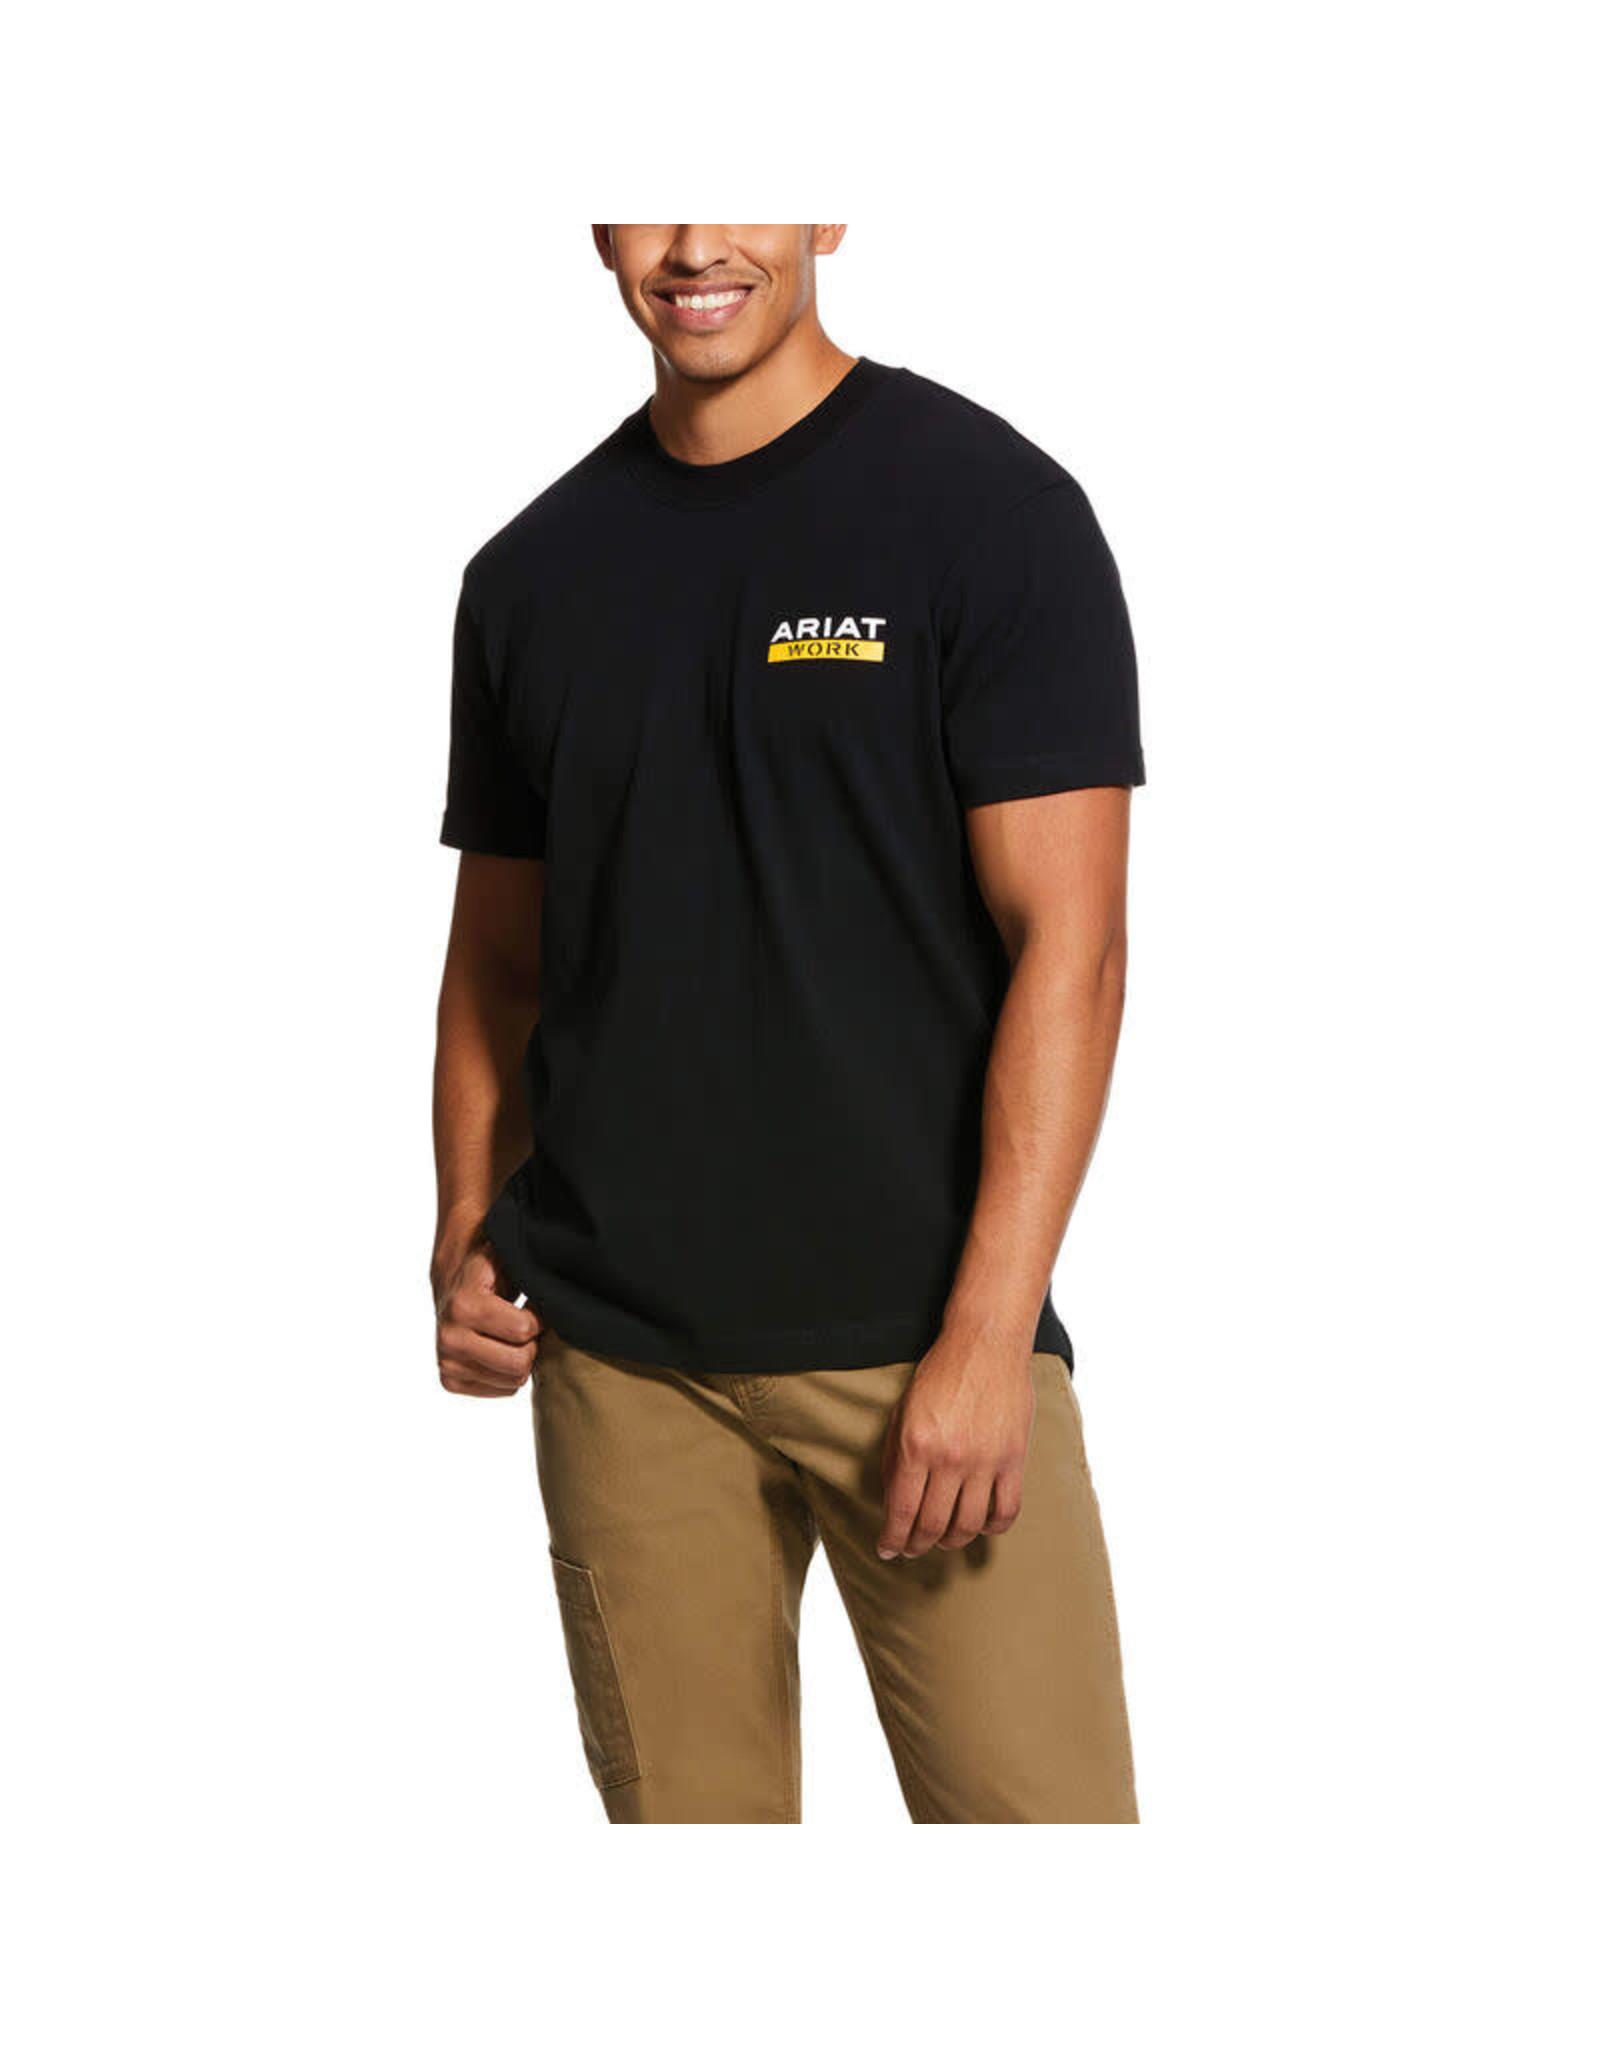 Ariat Rebar Cotton Strong Roughneck Graphic T-Shirt